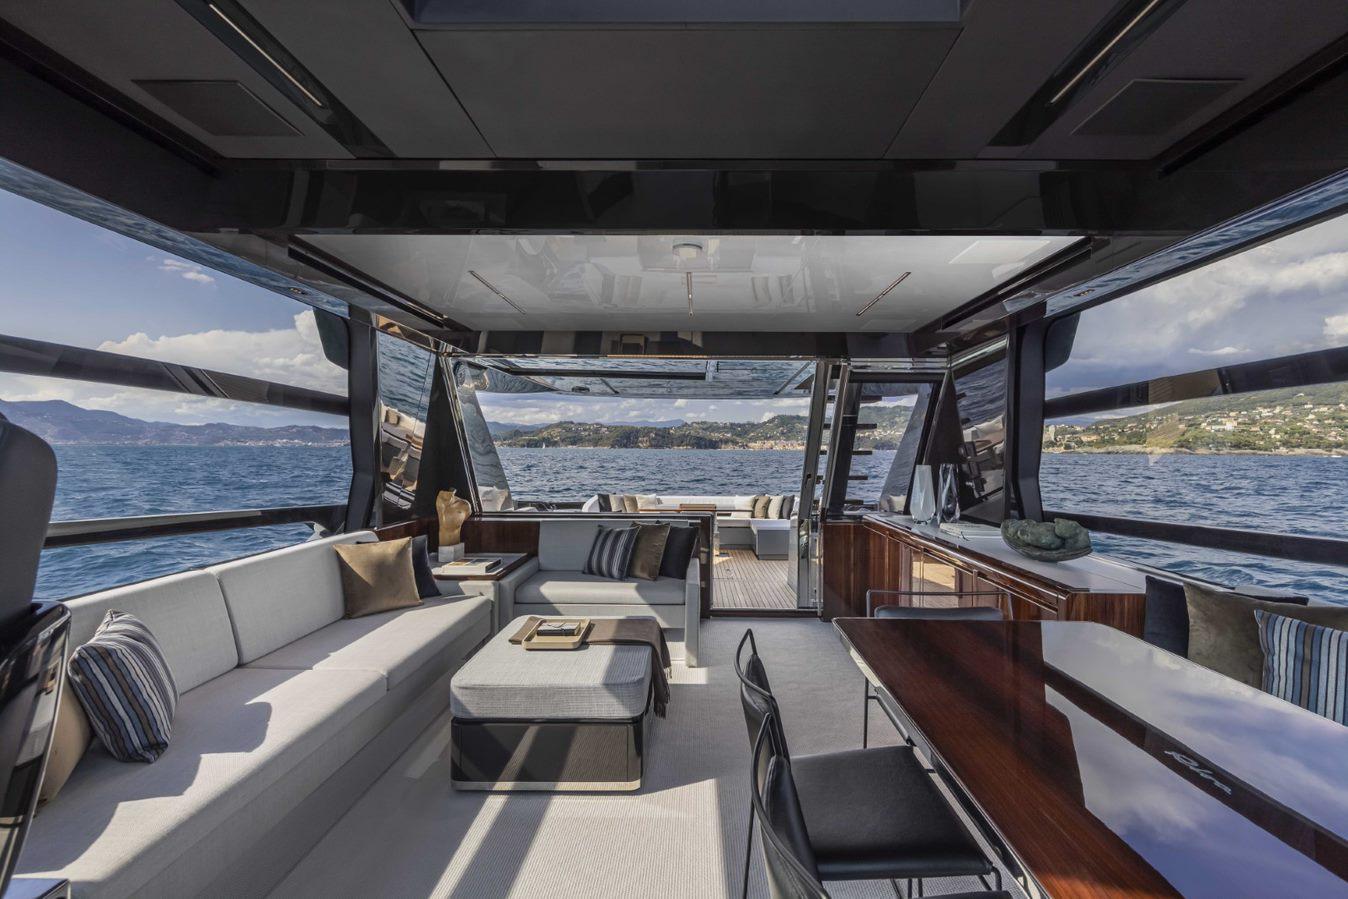 Riva 76 Perseo Super boat shopping 7